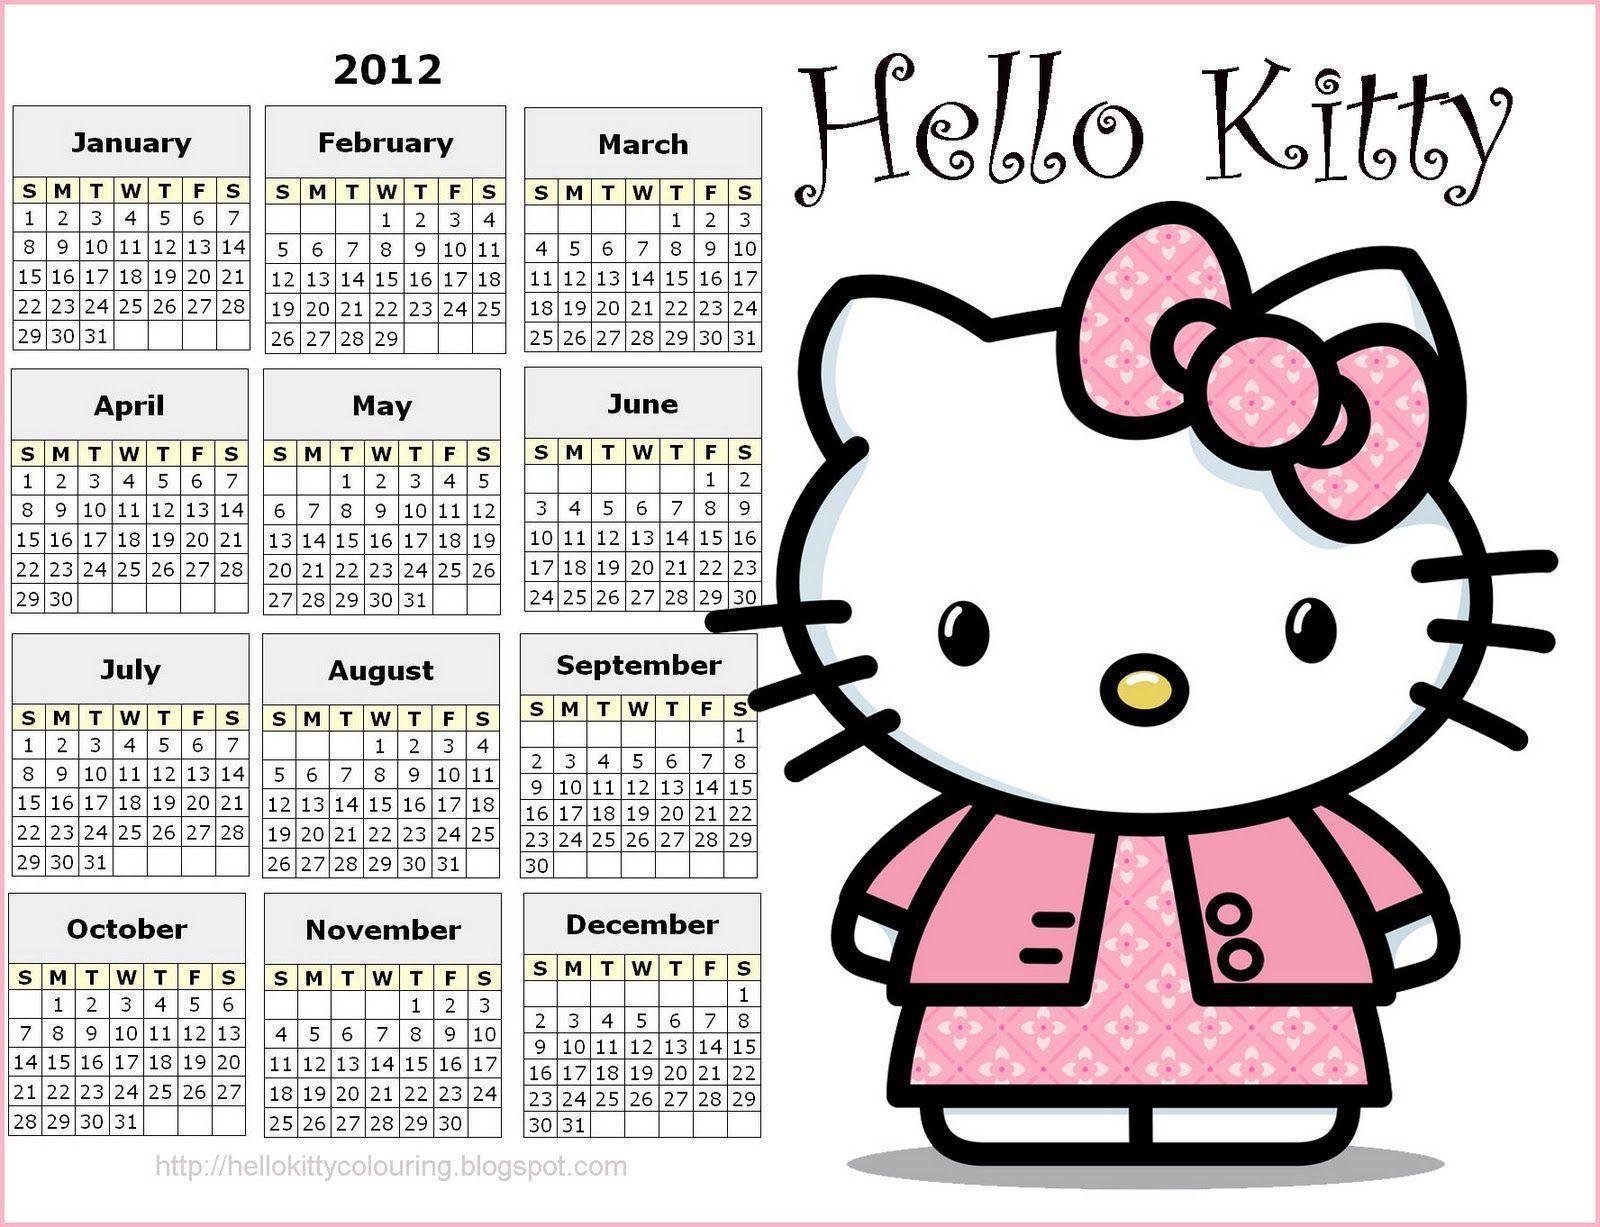 Fantastic Wallpaper Hello Kitty Calendar - 9PVgnFc  Snapshot_46914.jpg